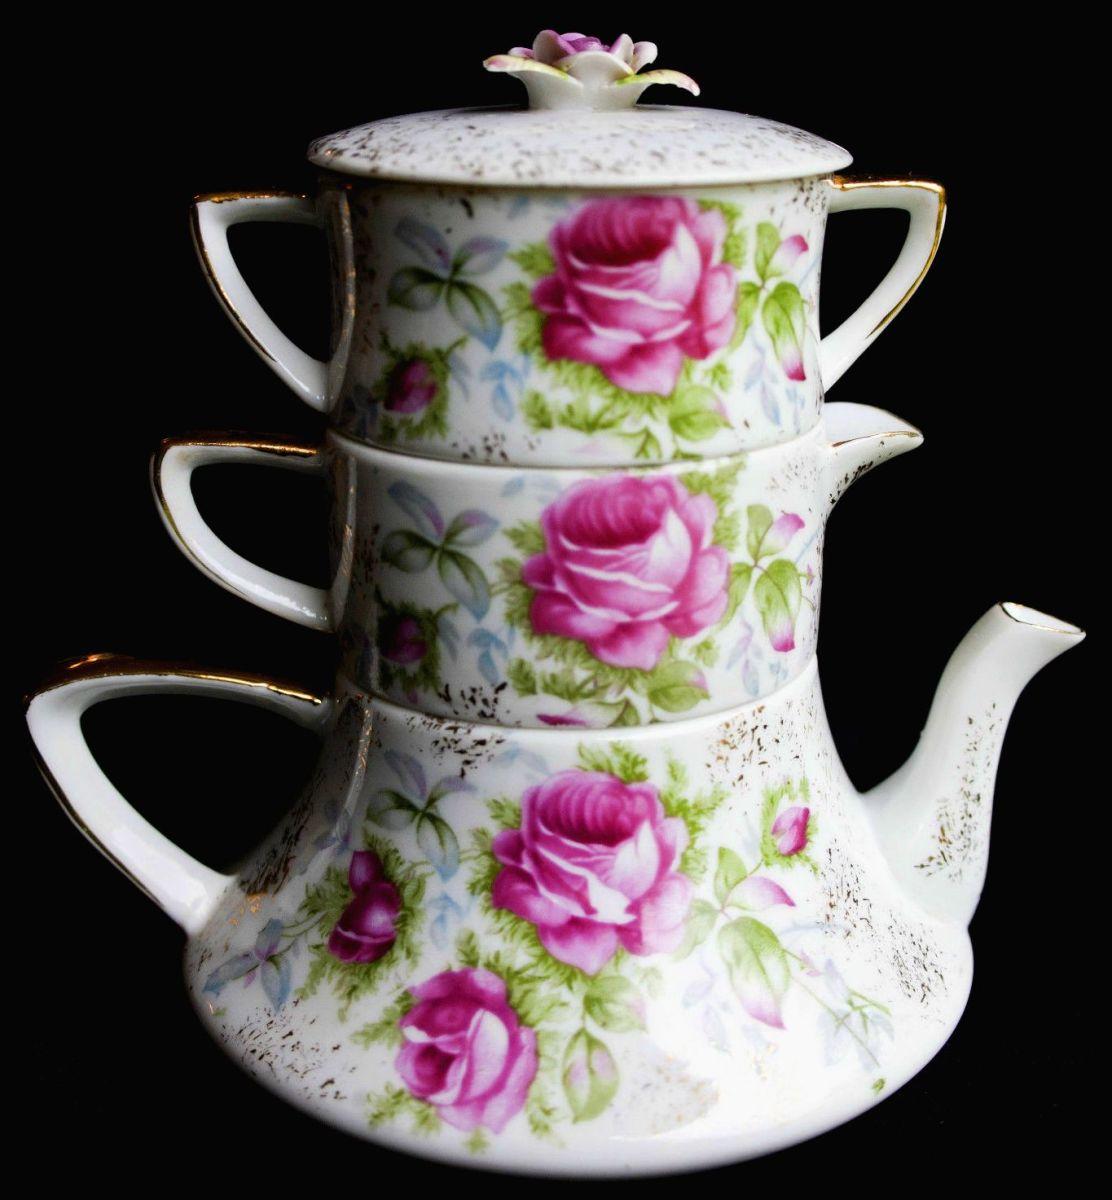 rose-teapots